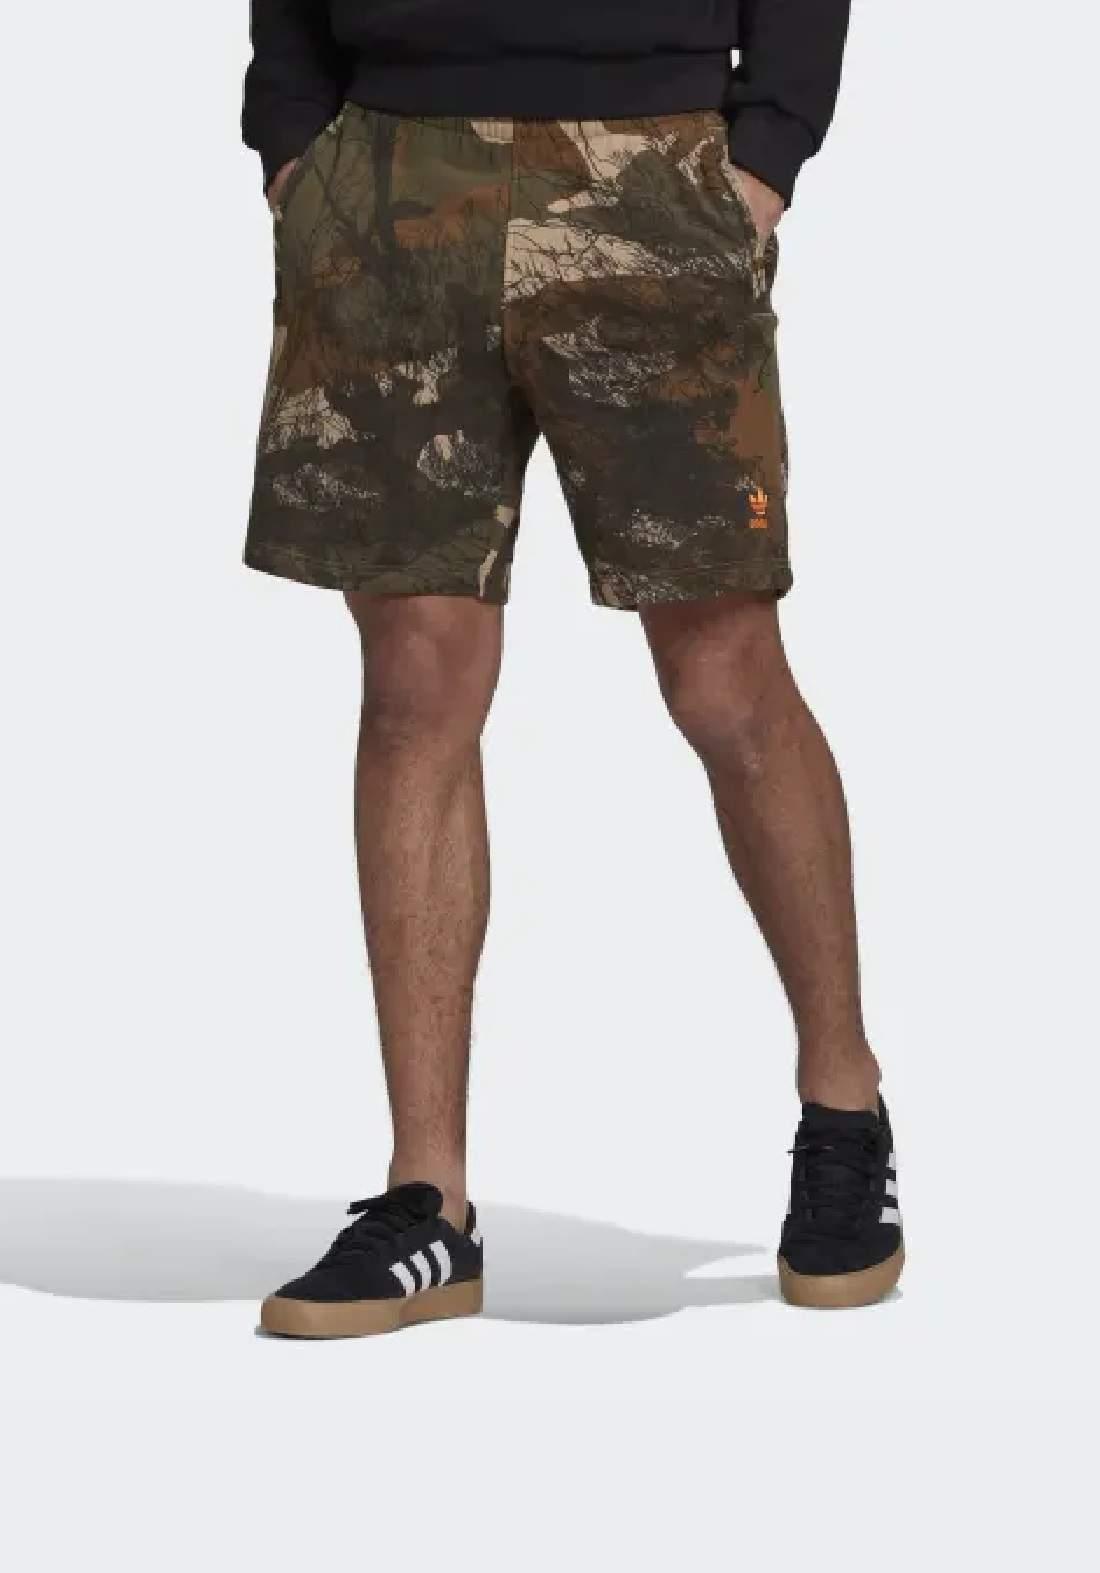 Adidas شورت رجالي متعدد الالوان من